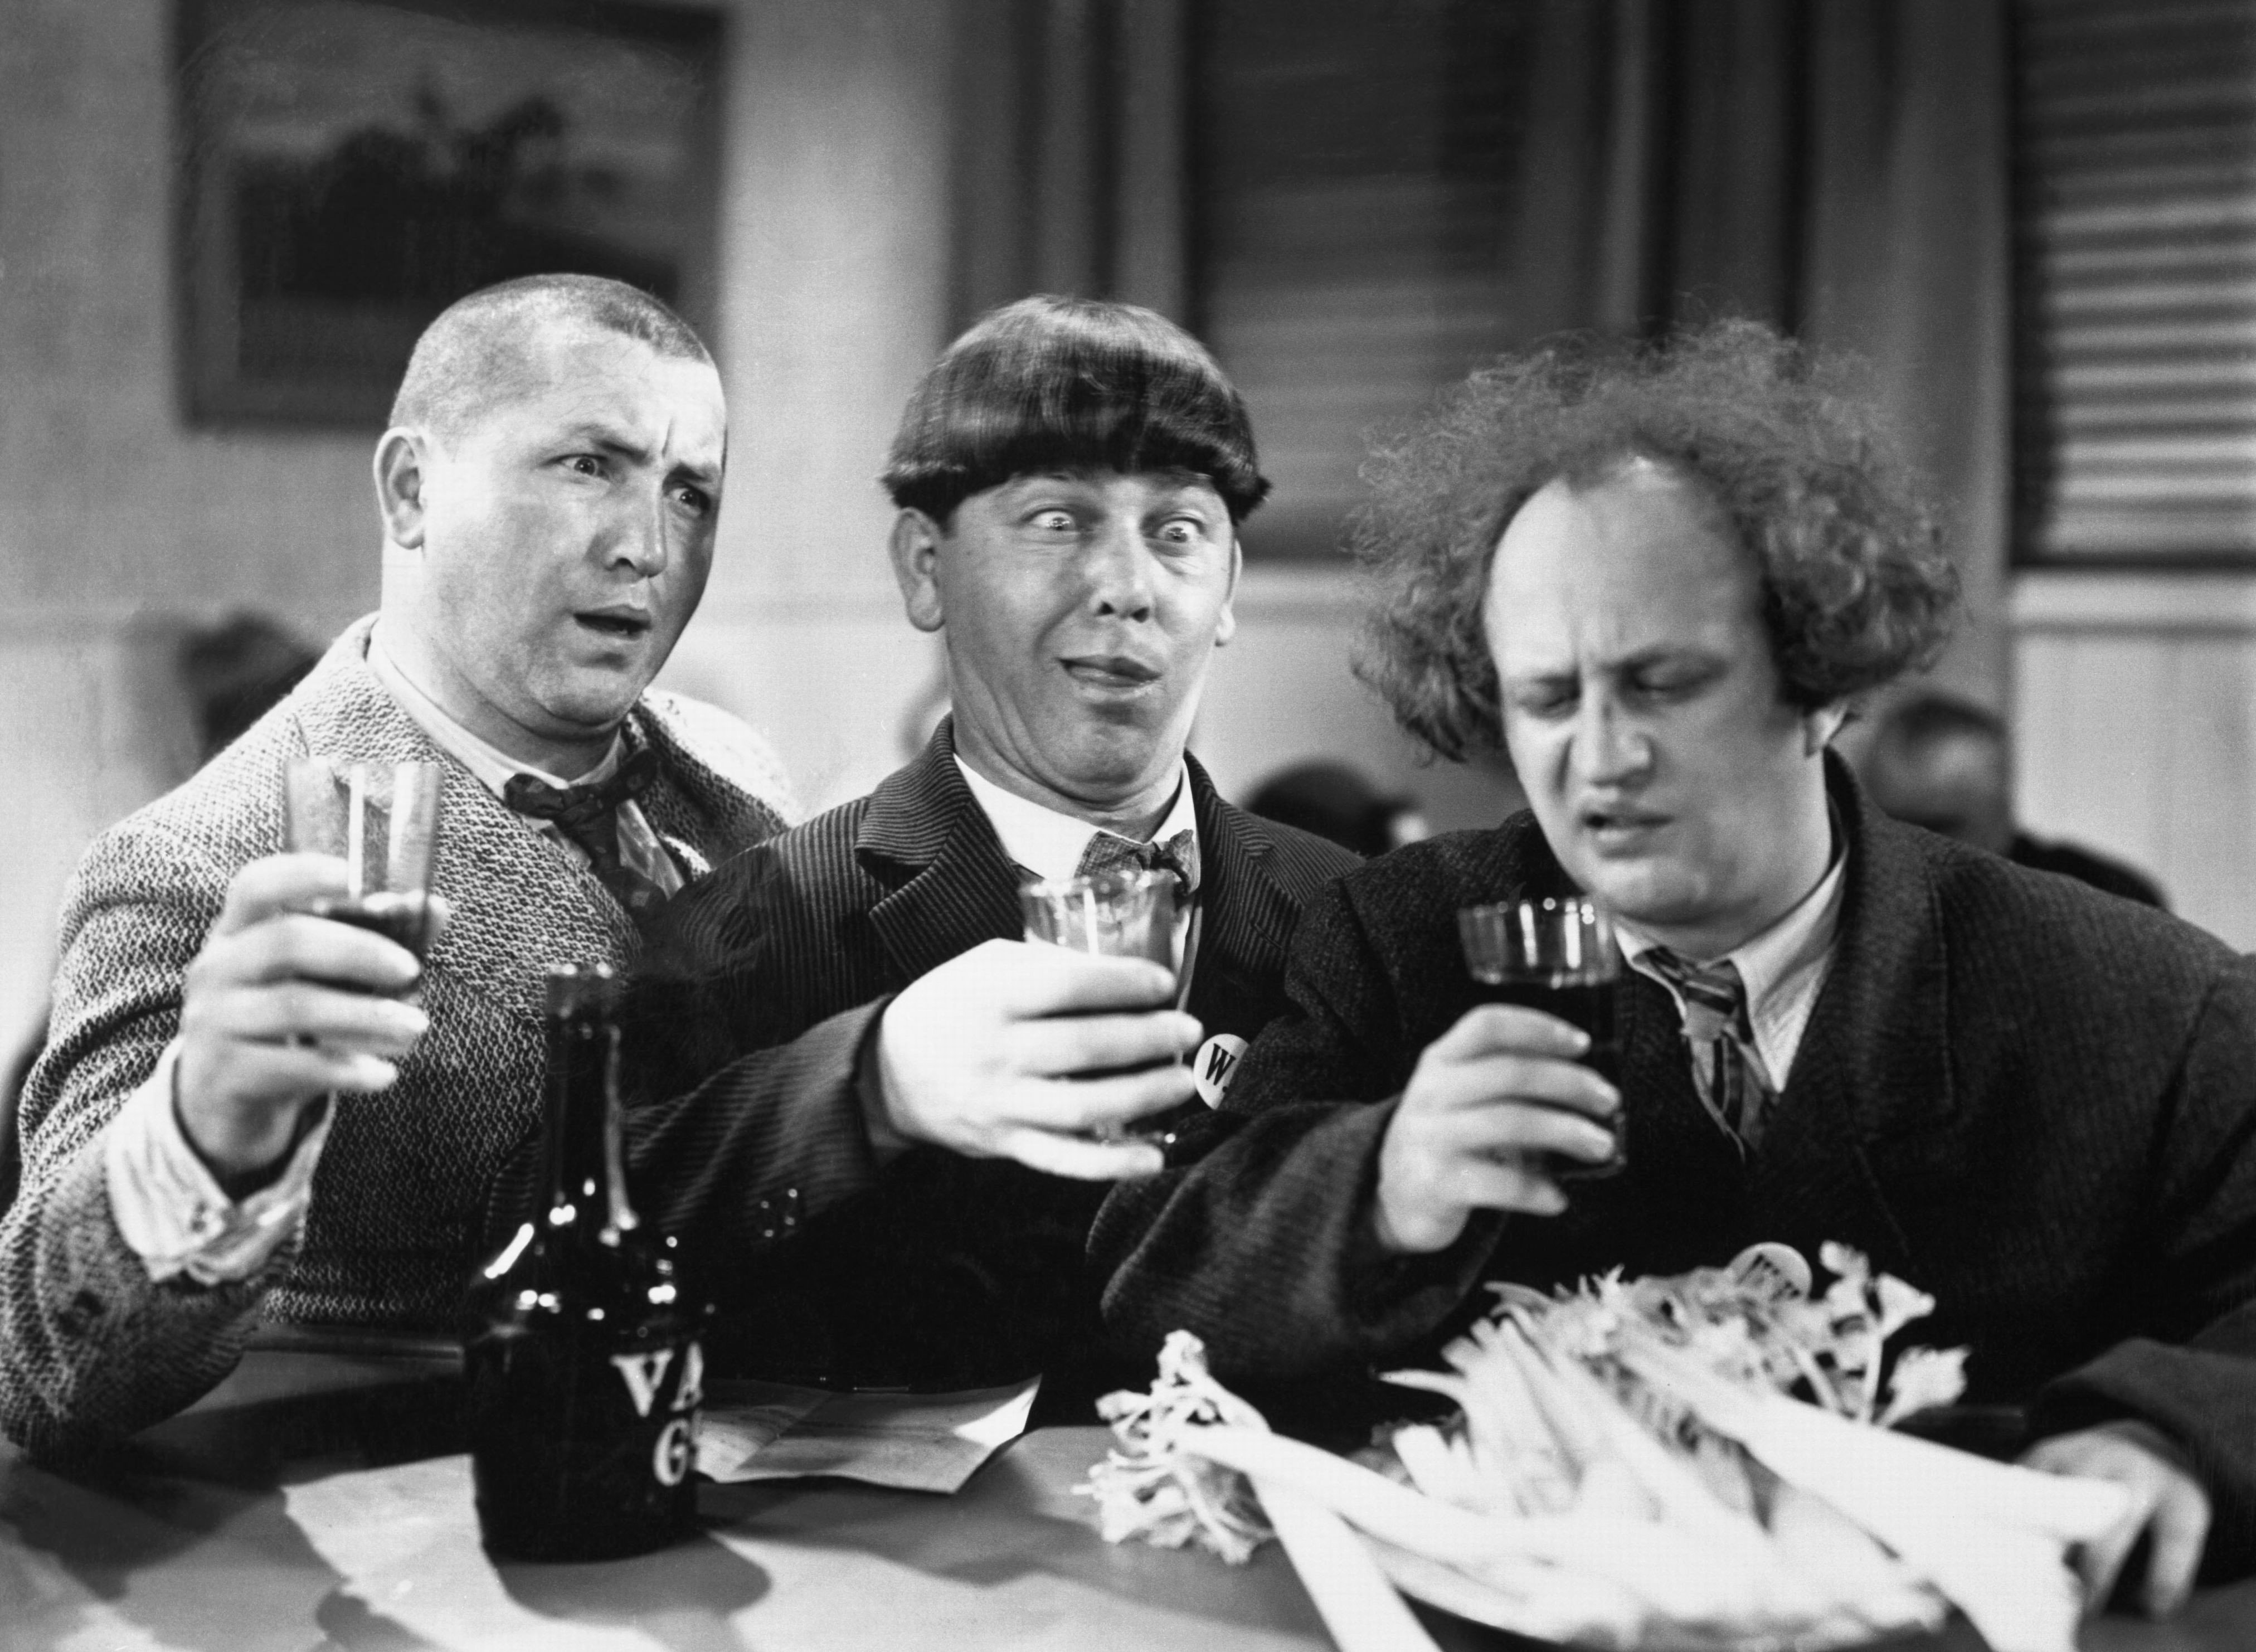 The Three Stooges  Porto  Film Stills Hd Wallpapers